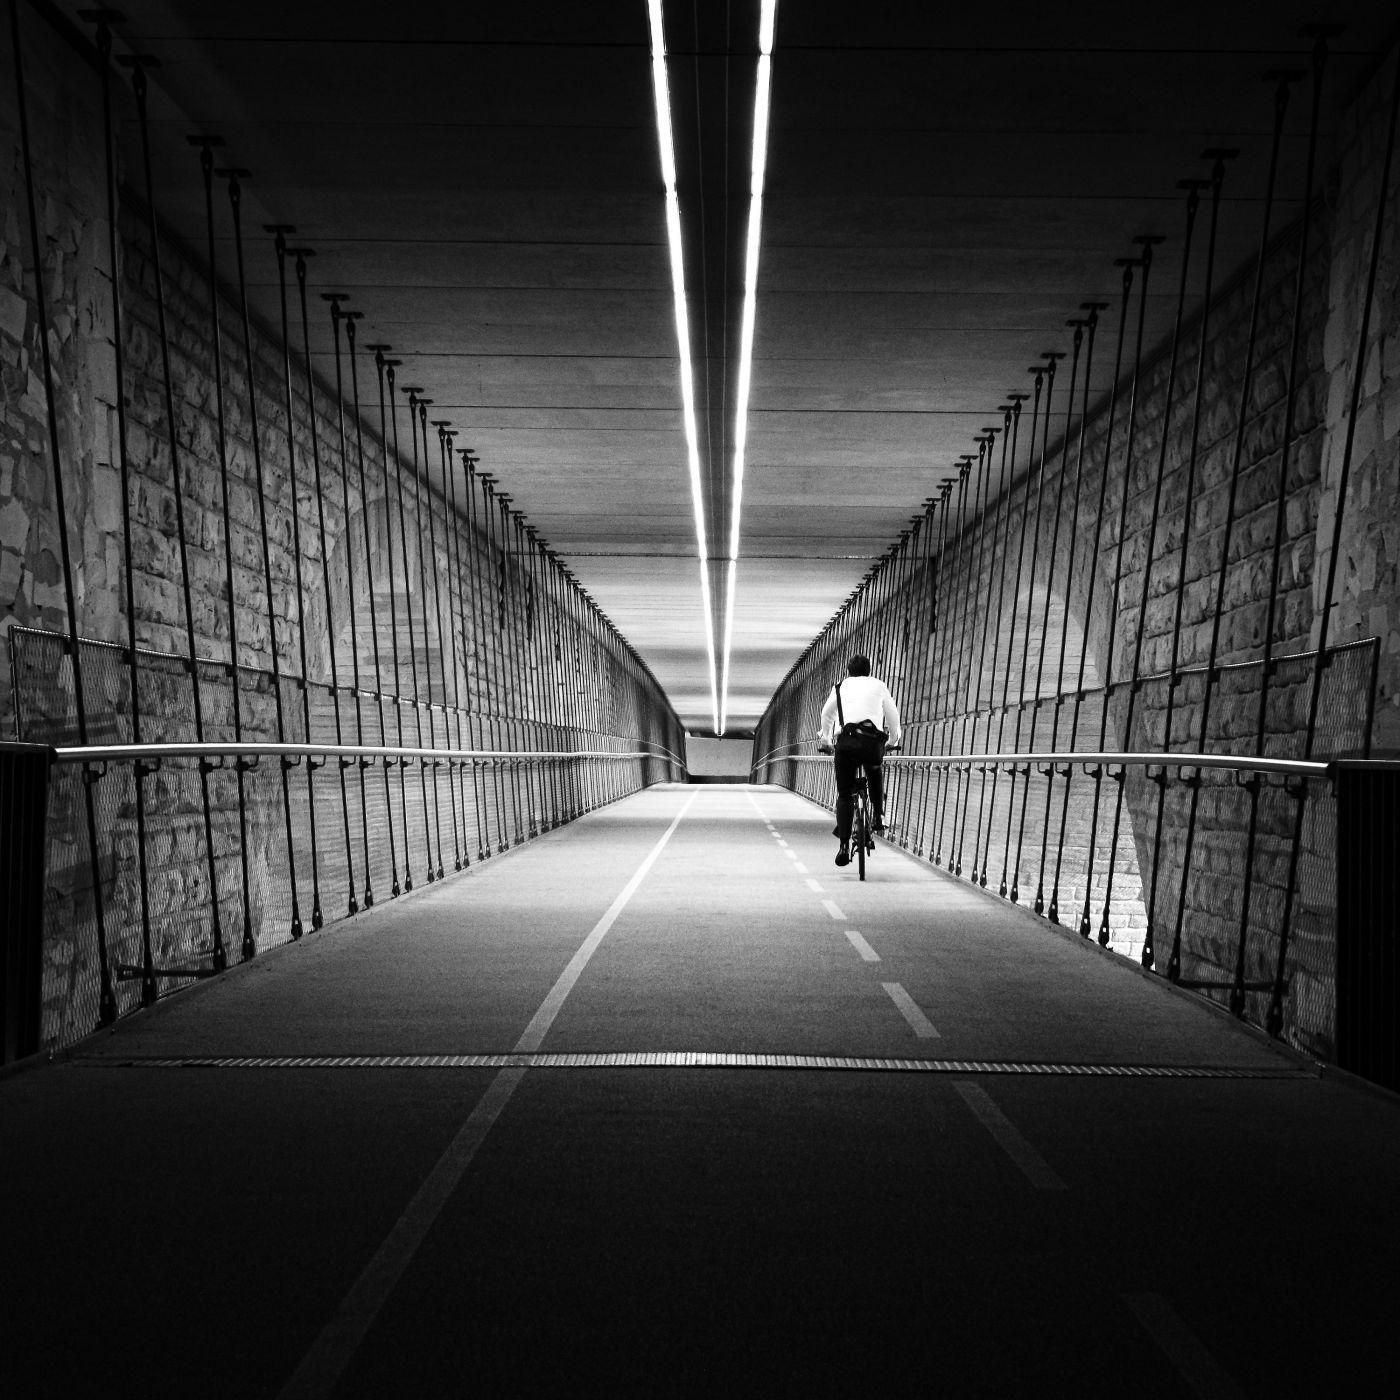 Under the Adolphe Bridge, Luxembourg